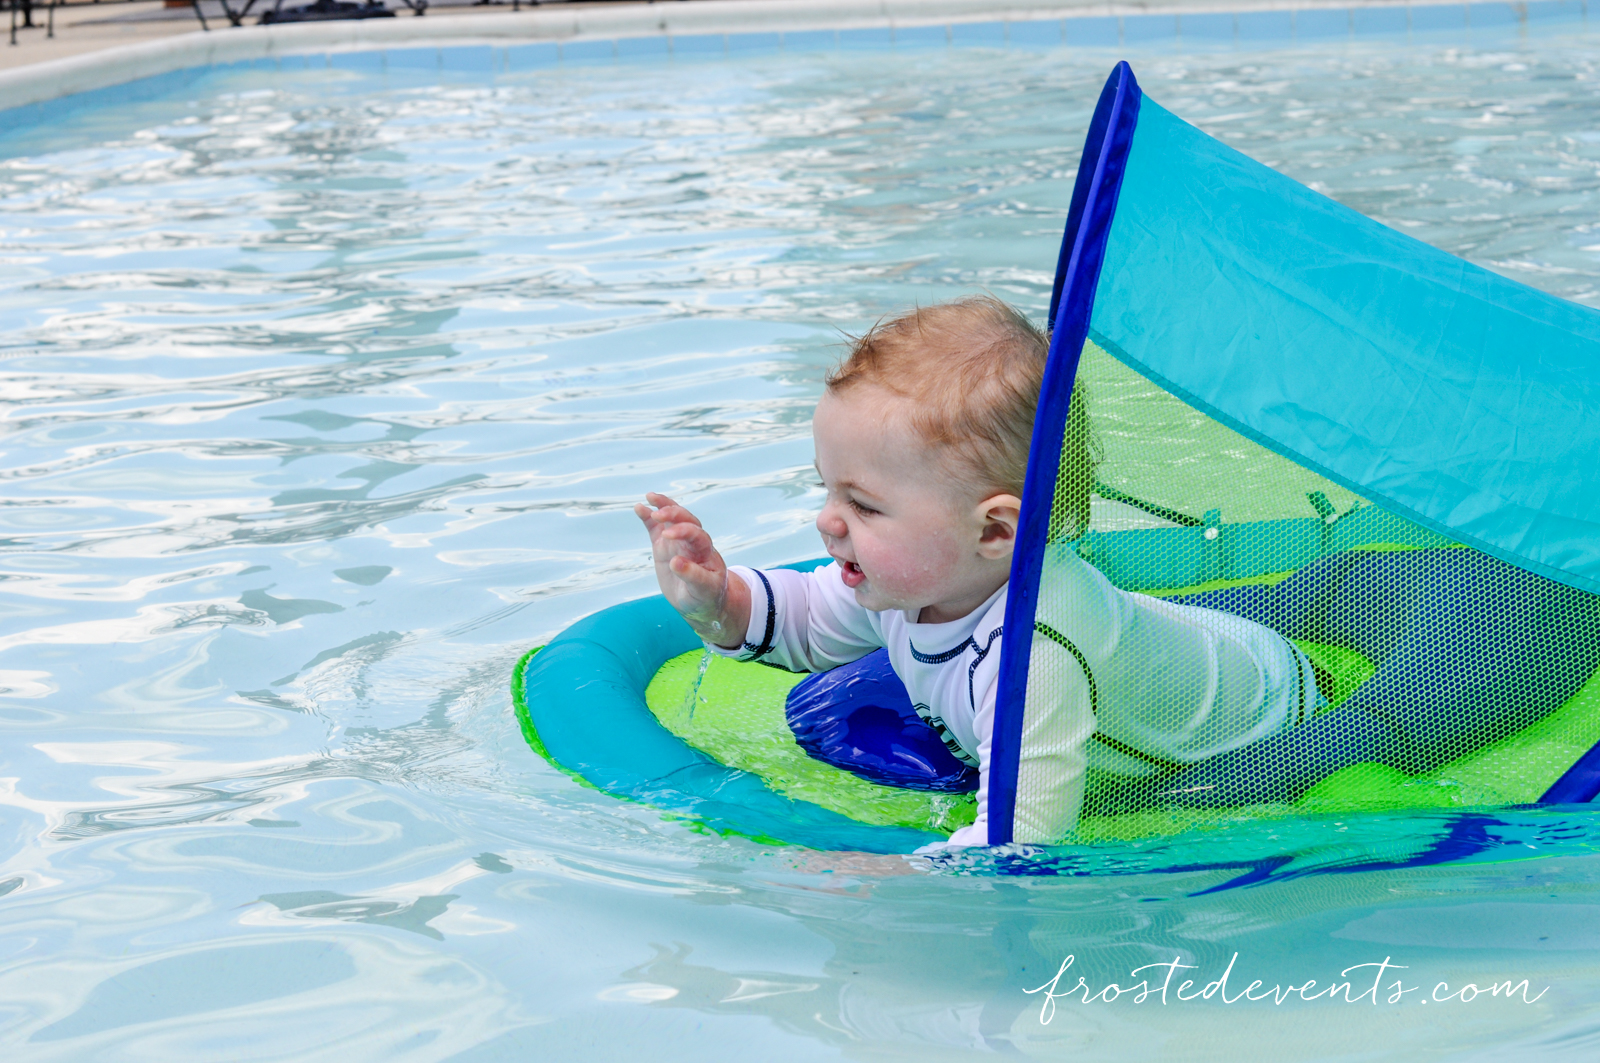 swimways-national-swim-day-teaching-kids-to-swim-4